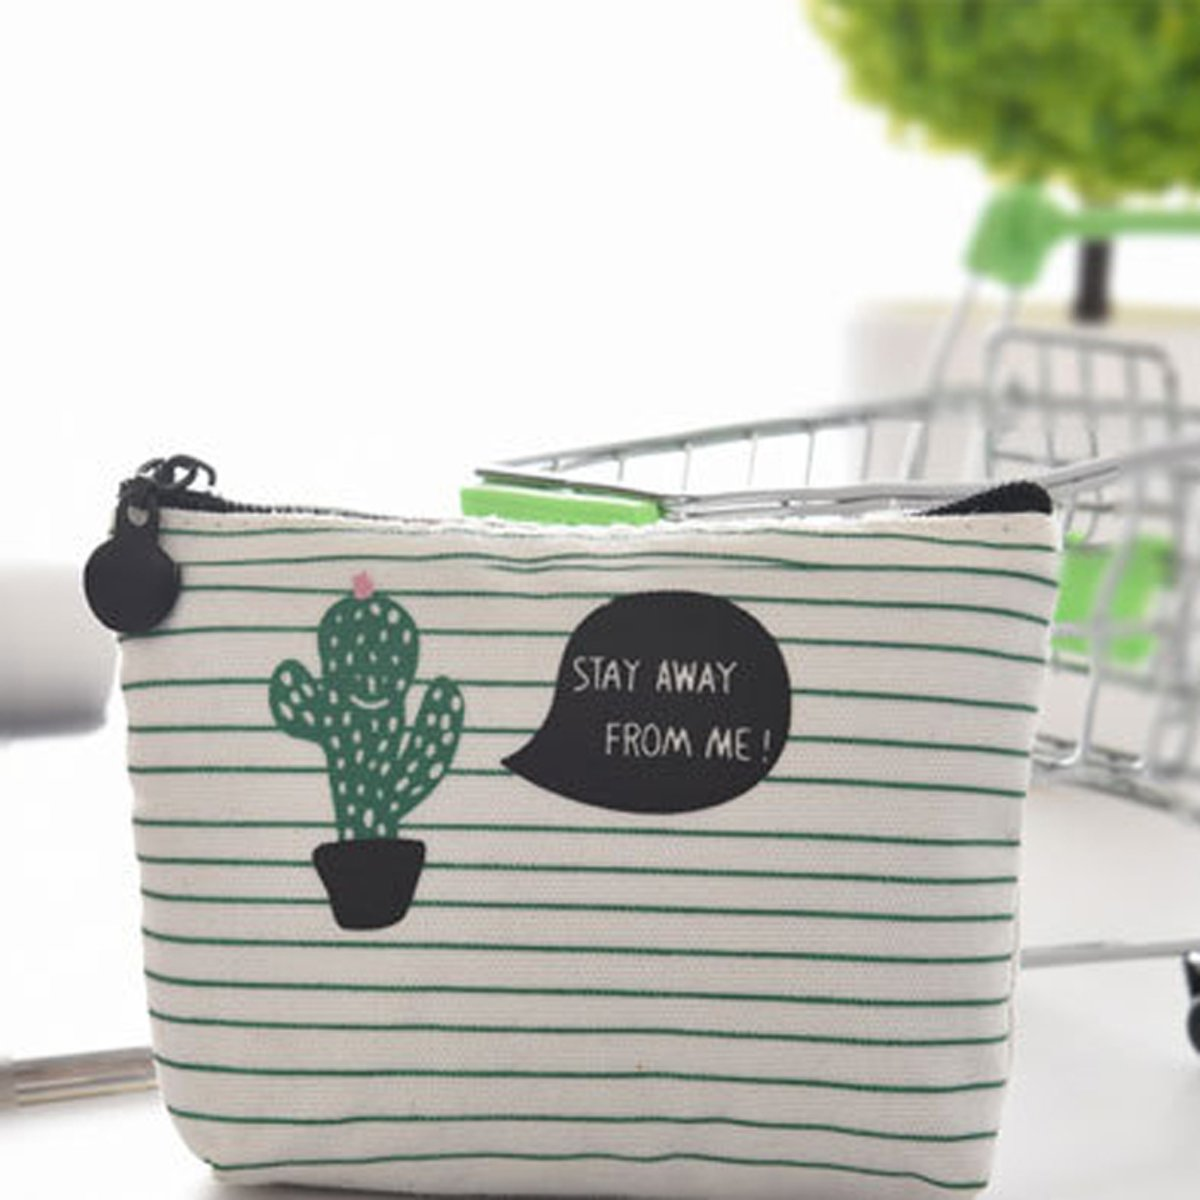 Trendy Portemonnee.Top Honderd Trendy Portemonnee Cactus Canvas Portemonne Kleine